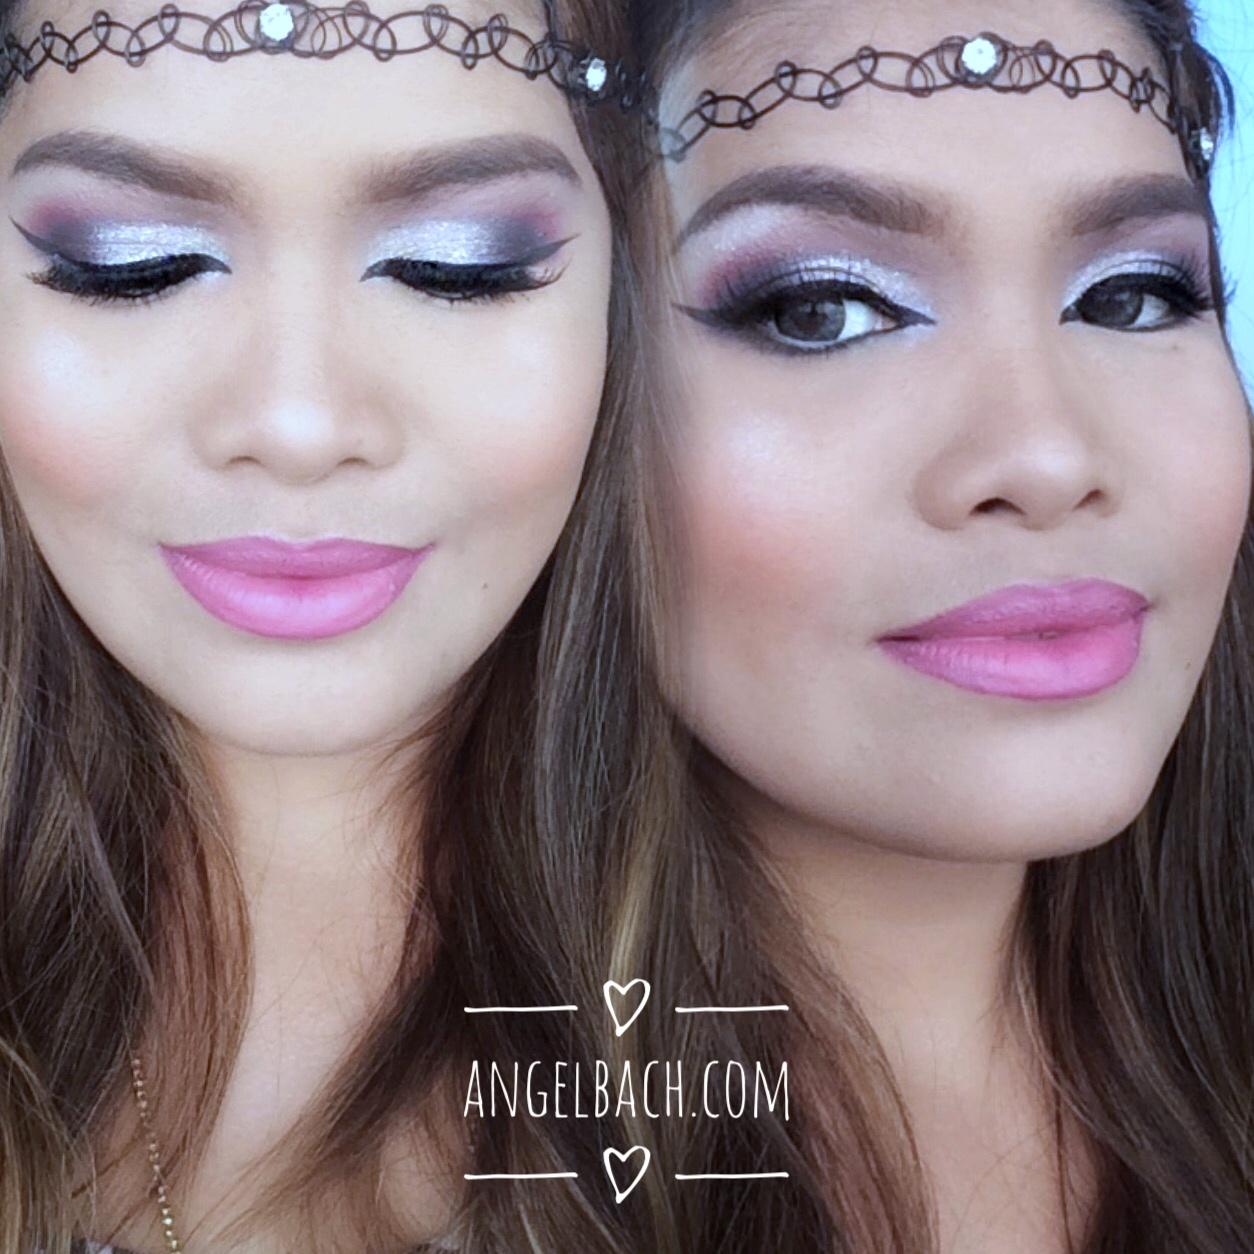 Arabian look, half cut crease, silver crease, pink lipstick, cat eye, wing eyeliner, angel bach artistry, makeup artist